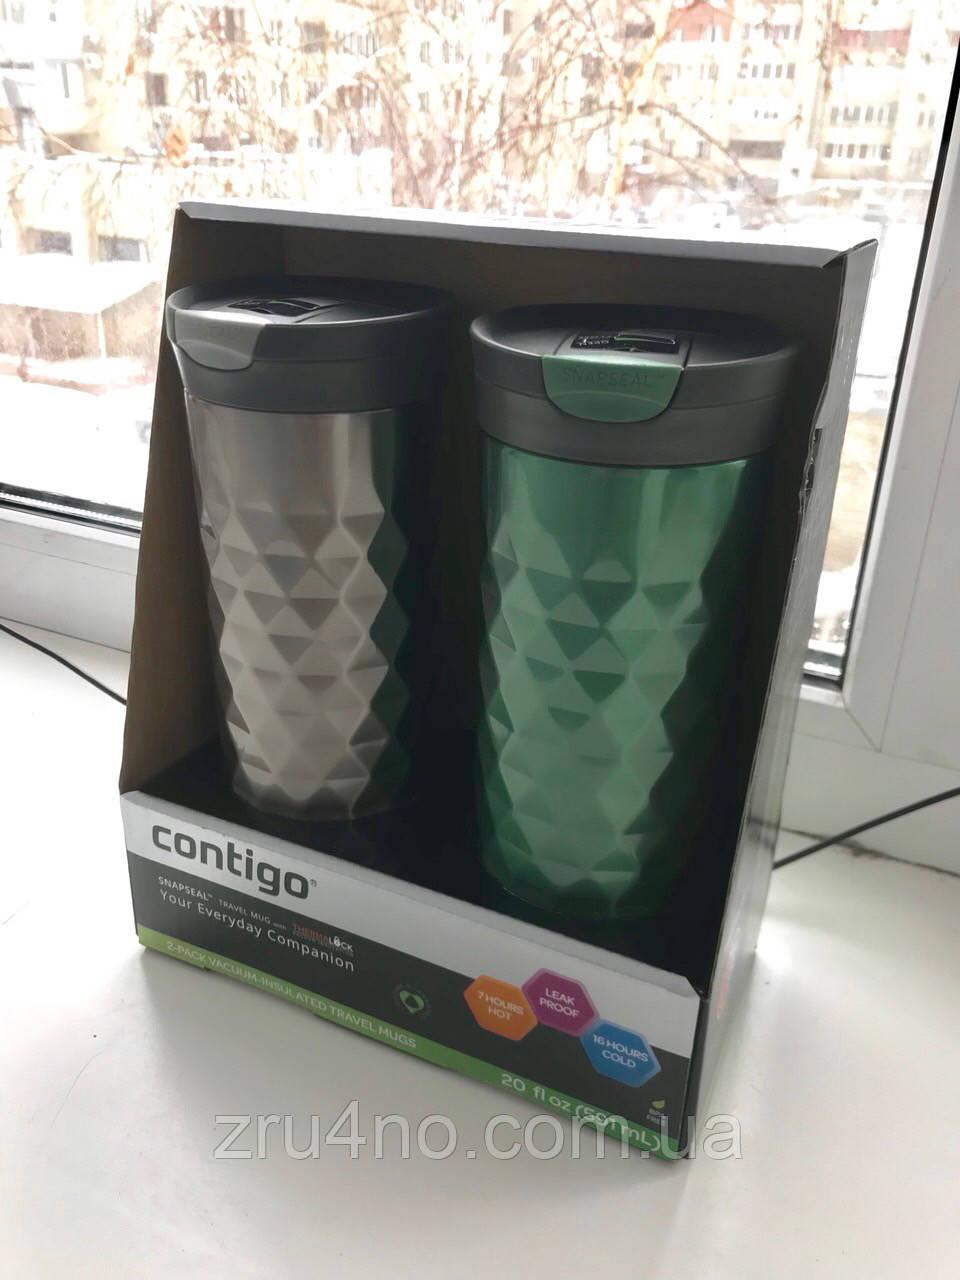 Подарунковий набір - Contigo SnapSeal Kenton Travel Mugs 0,59 л, 2 шт. (1000-0500)